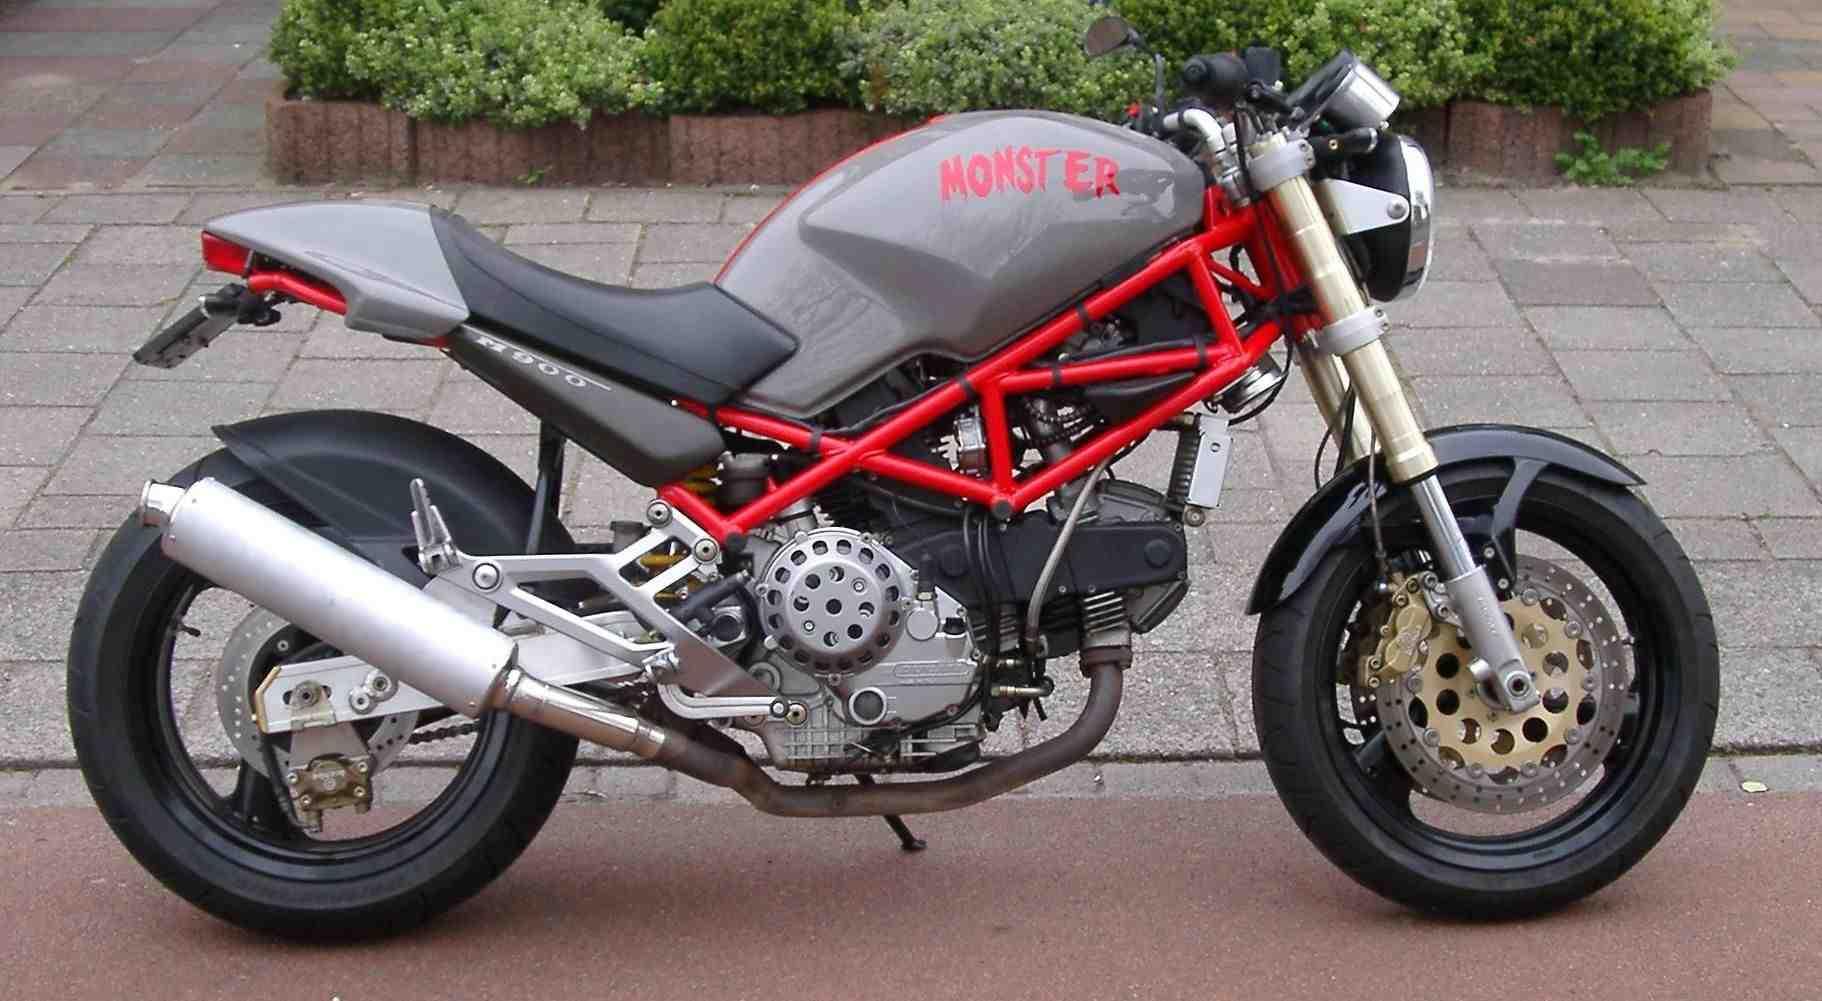 Ducati M900 Motorcycle 1993 2000 Workshop Repair Service Manual Complete Informative For Diy Repair Pagelarge